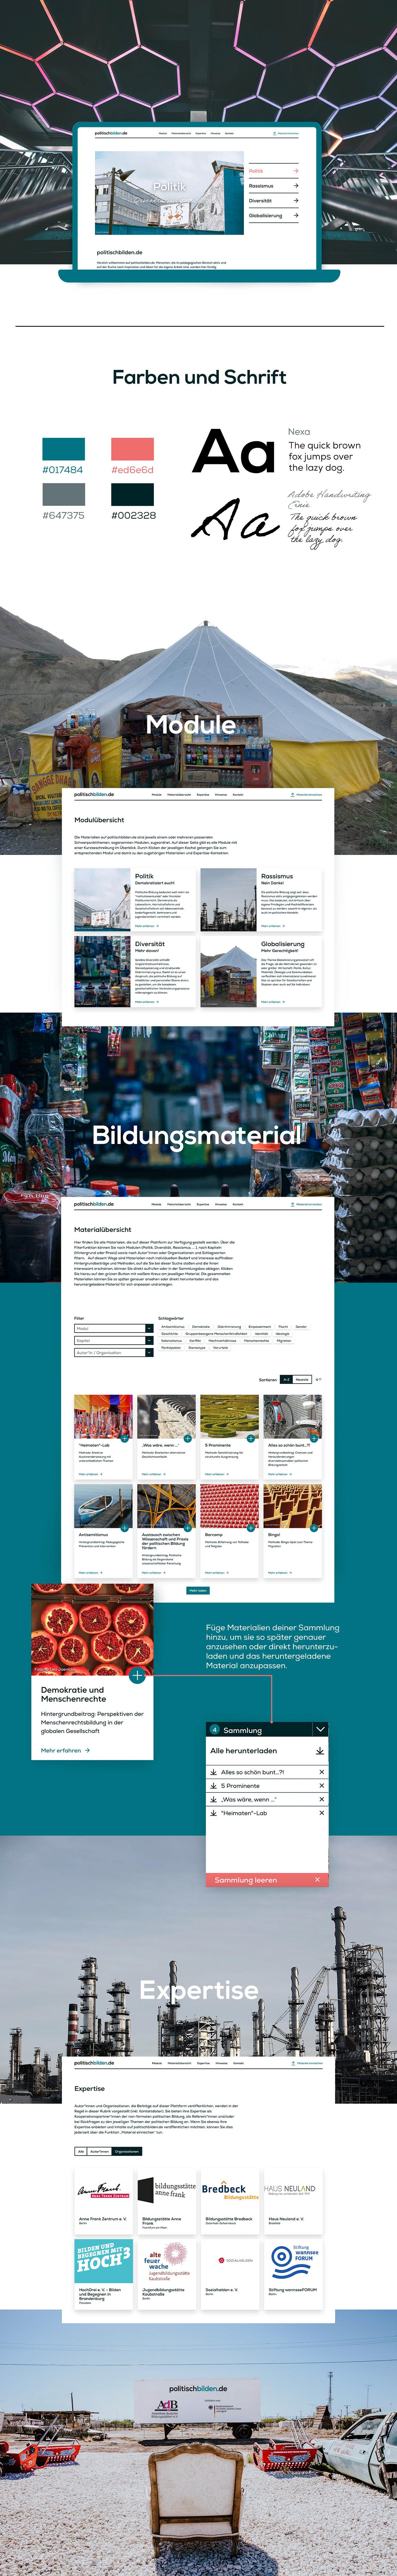 bildung design politik Webdesign Website